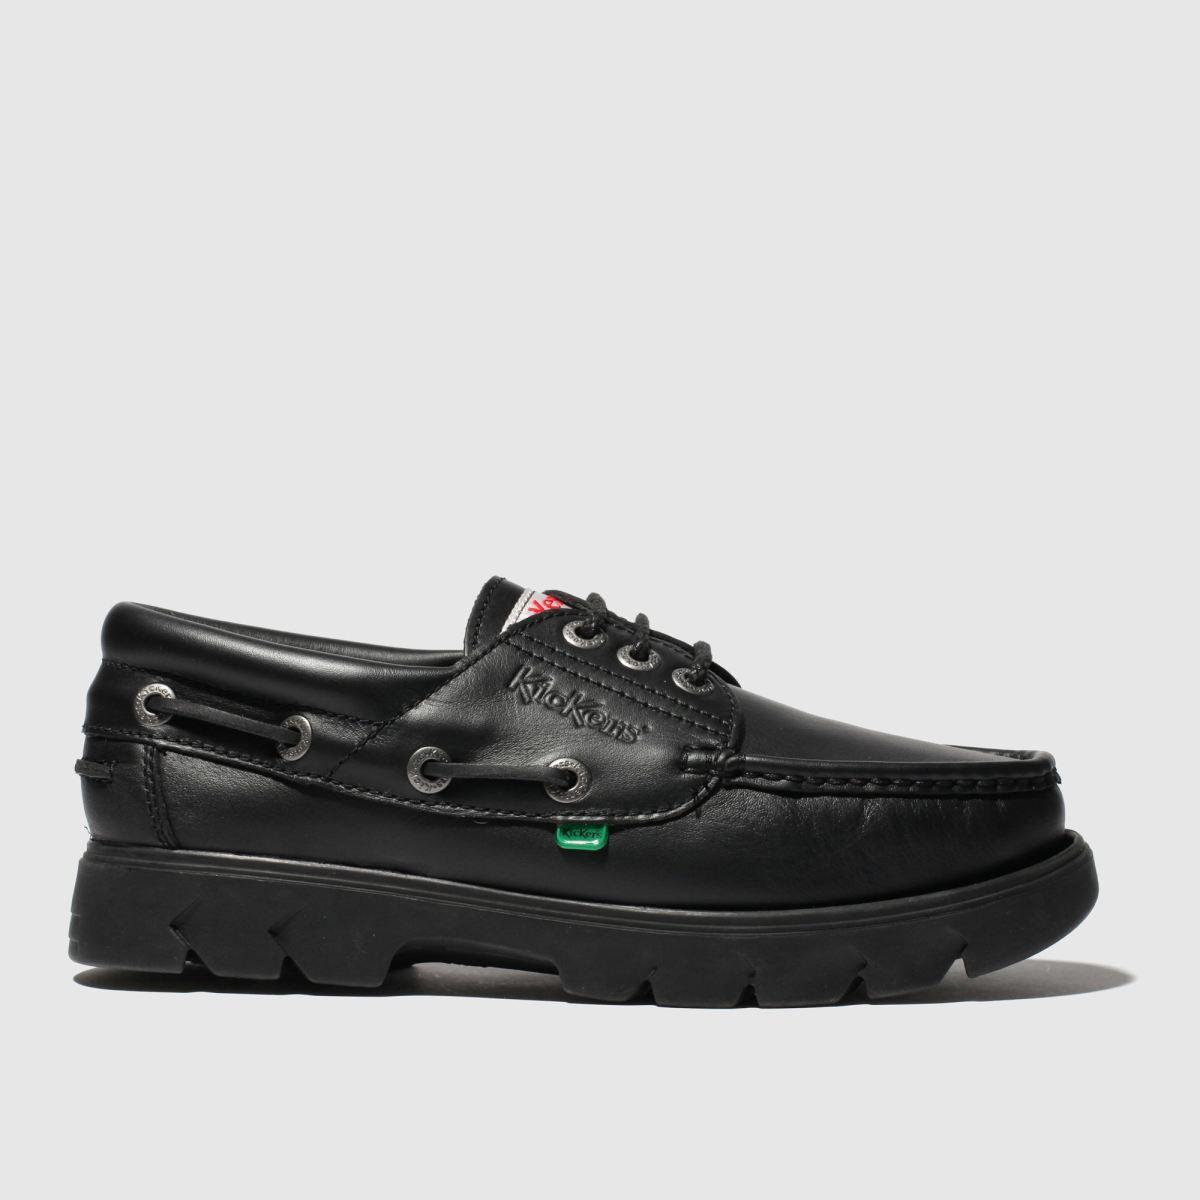 Kickers Kickers Black Lennon Boat Shoe Shoes